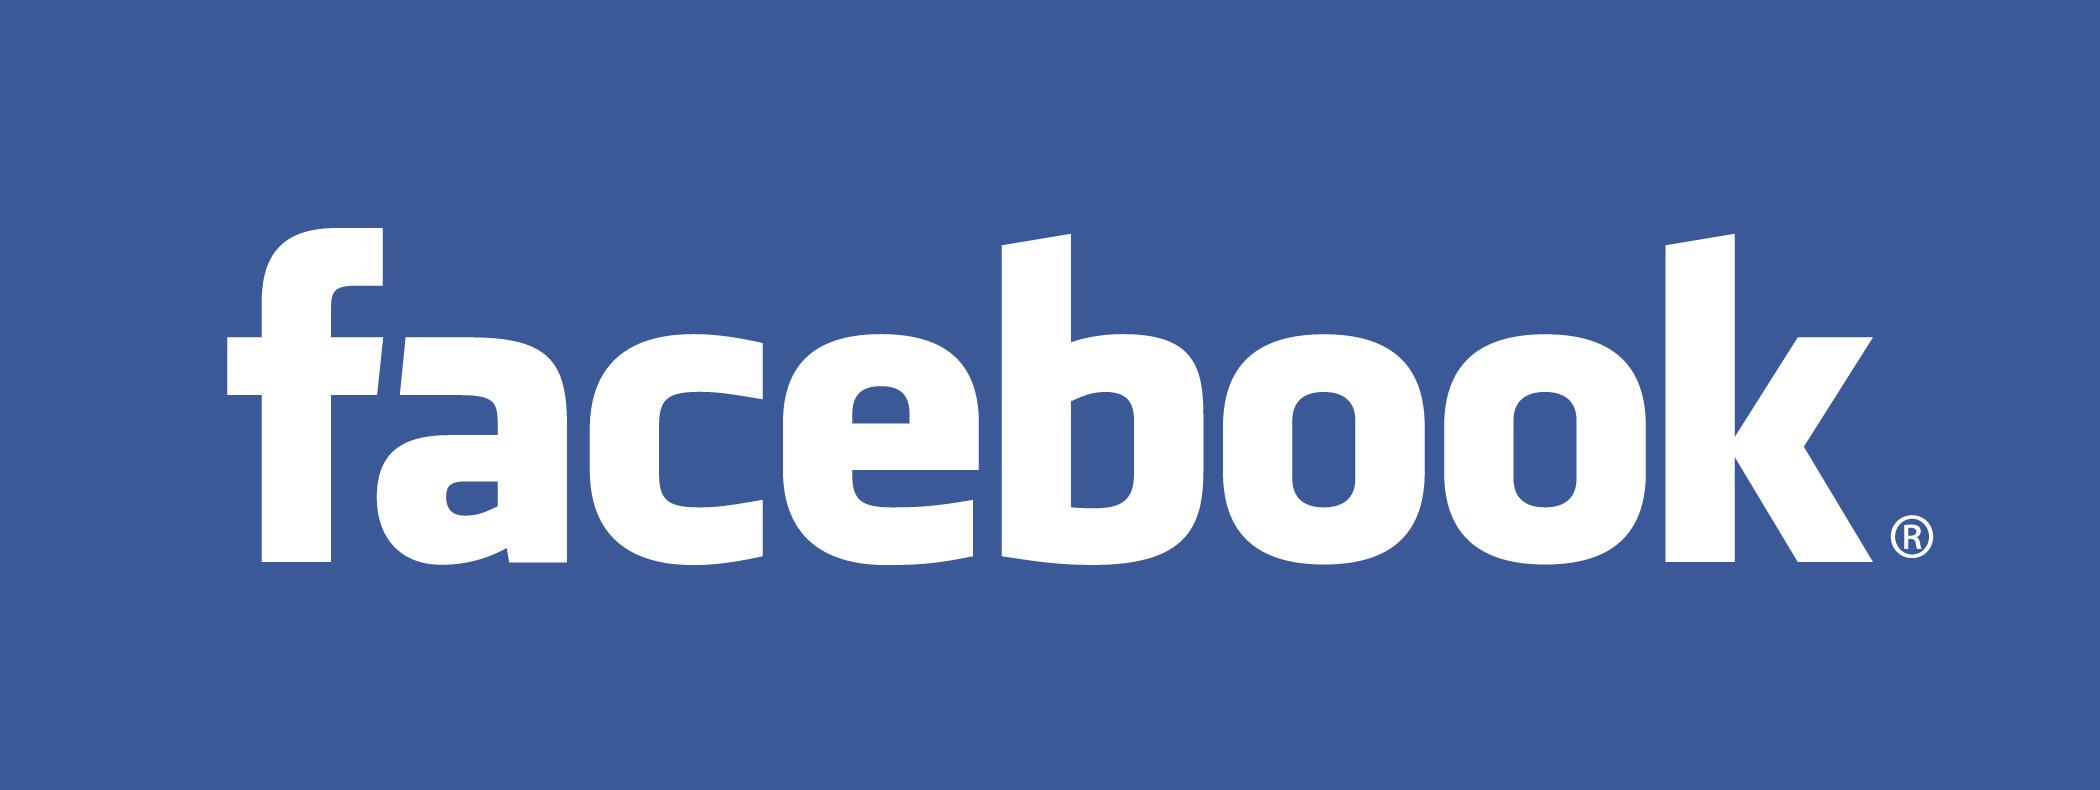 http://www.warsoft.fr/images/divers/airsoft-logo-facebook.jpg